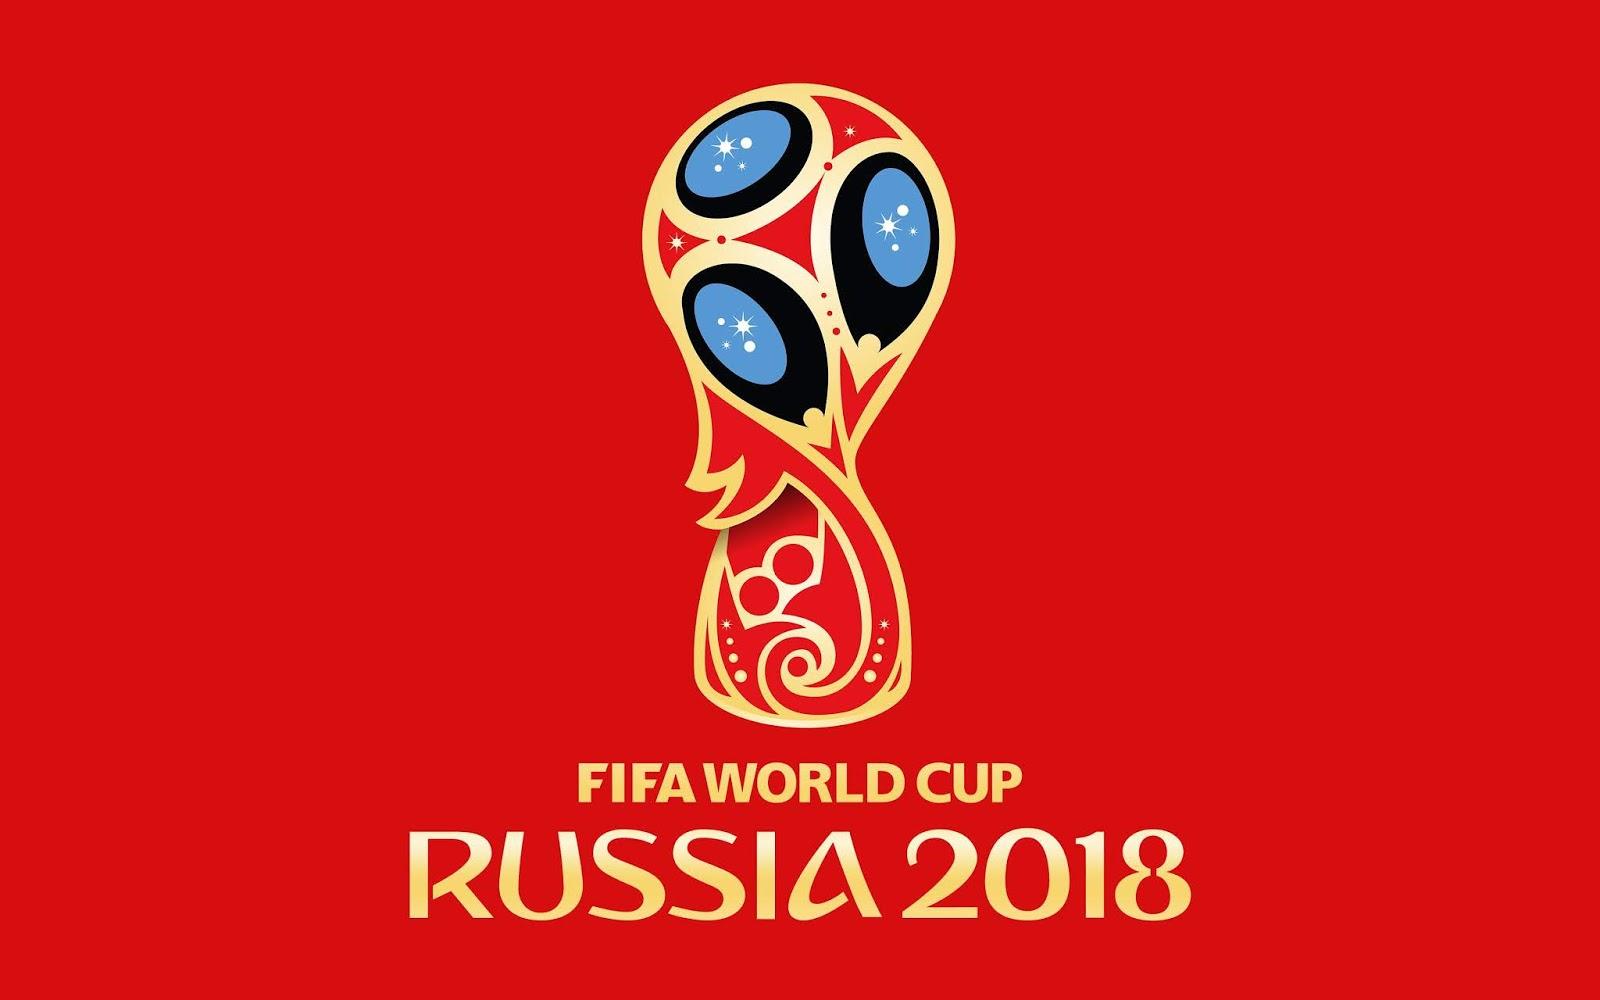 2018 FIFA World Cup, Russia, HD, 4K, Sports